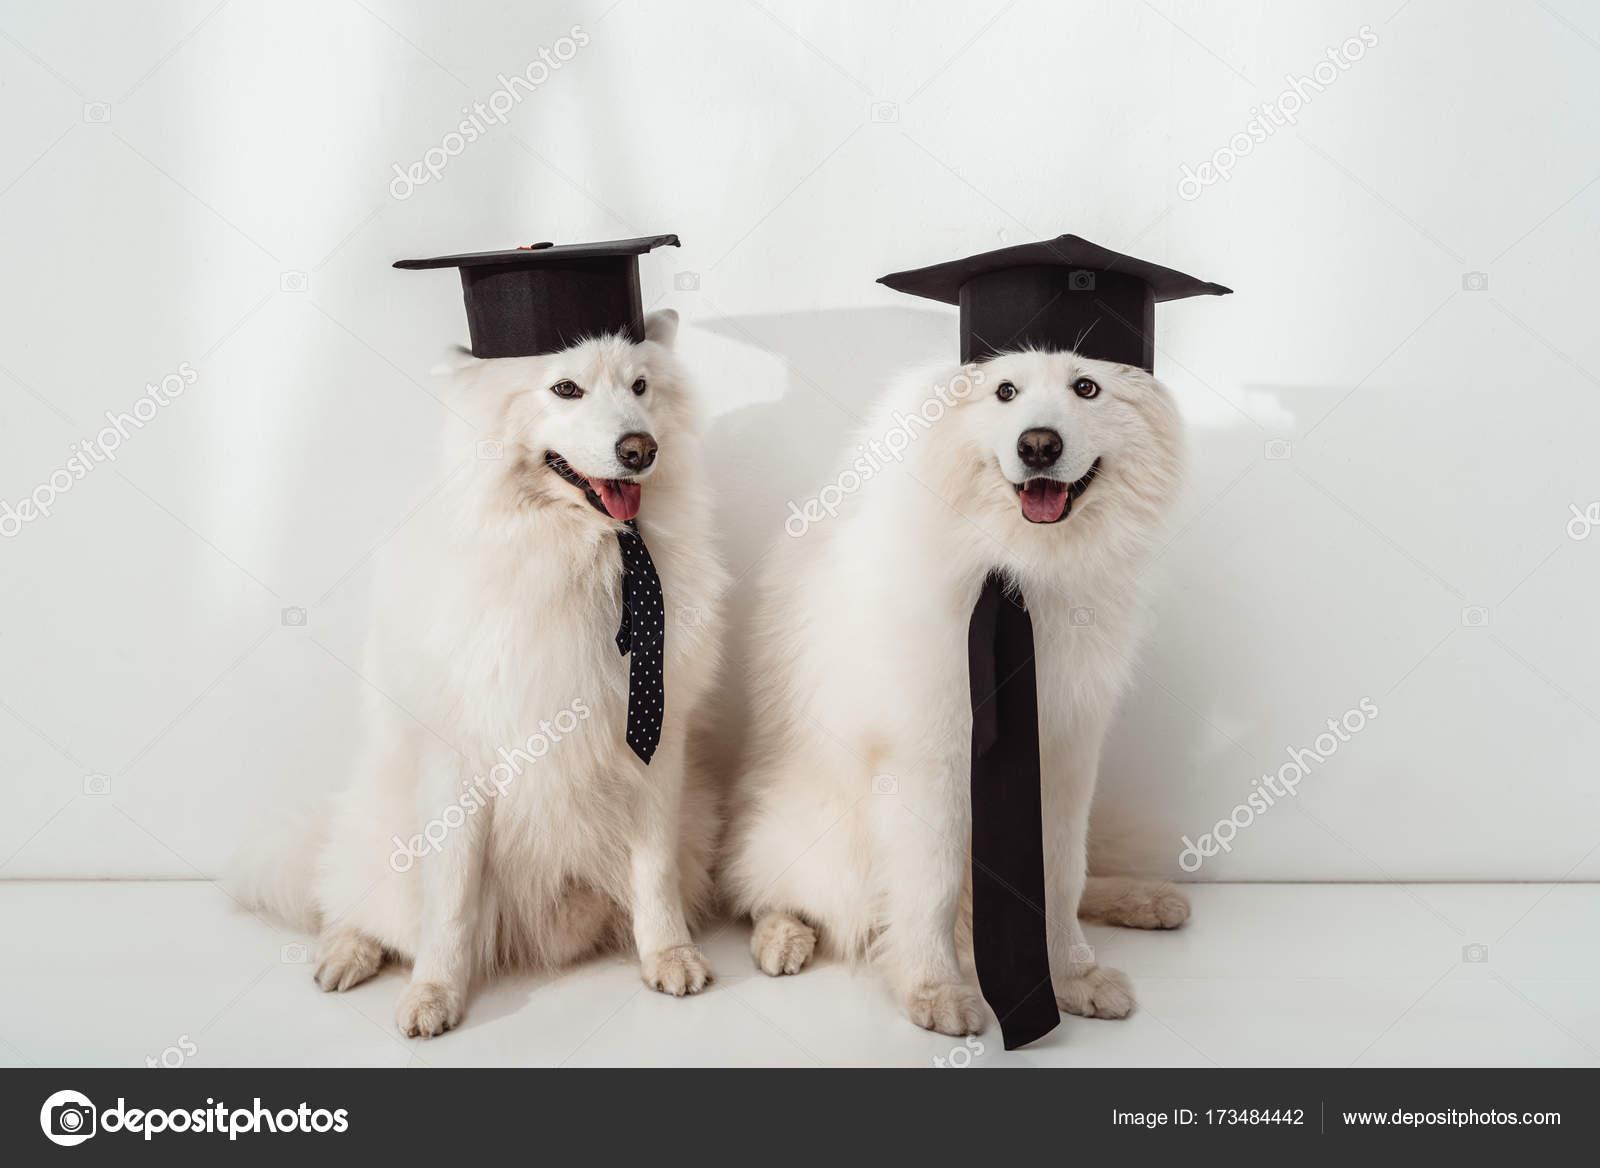 Cool Graduation Cap Black Adorable Dog - depositphotos_173484442-stock-photo-dogs-in-graduation-hats  HD_304998  .jpg